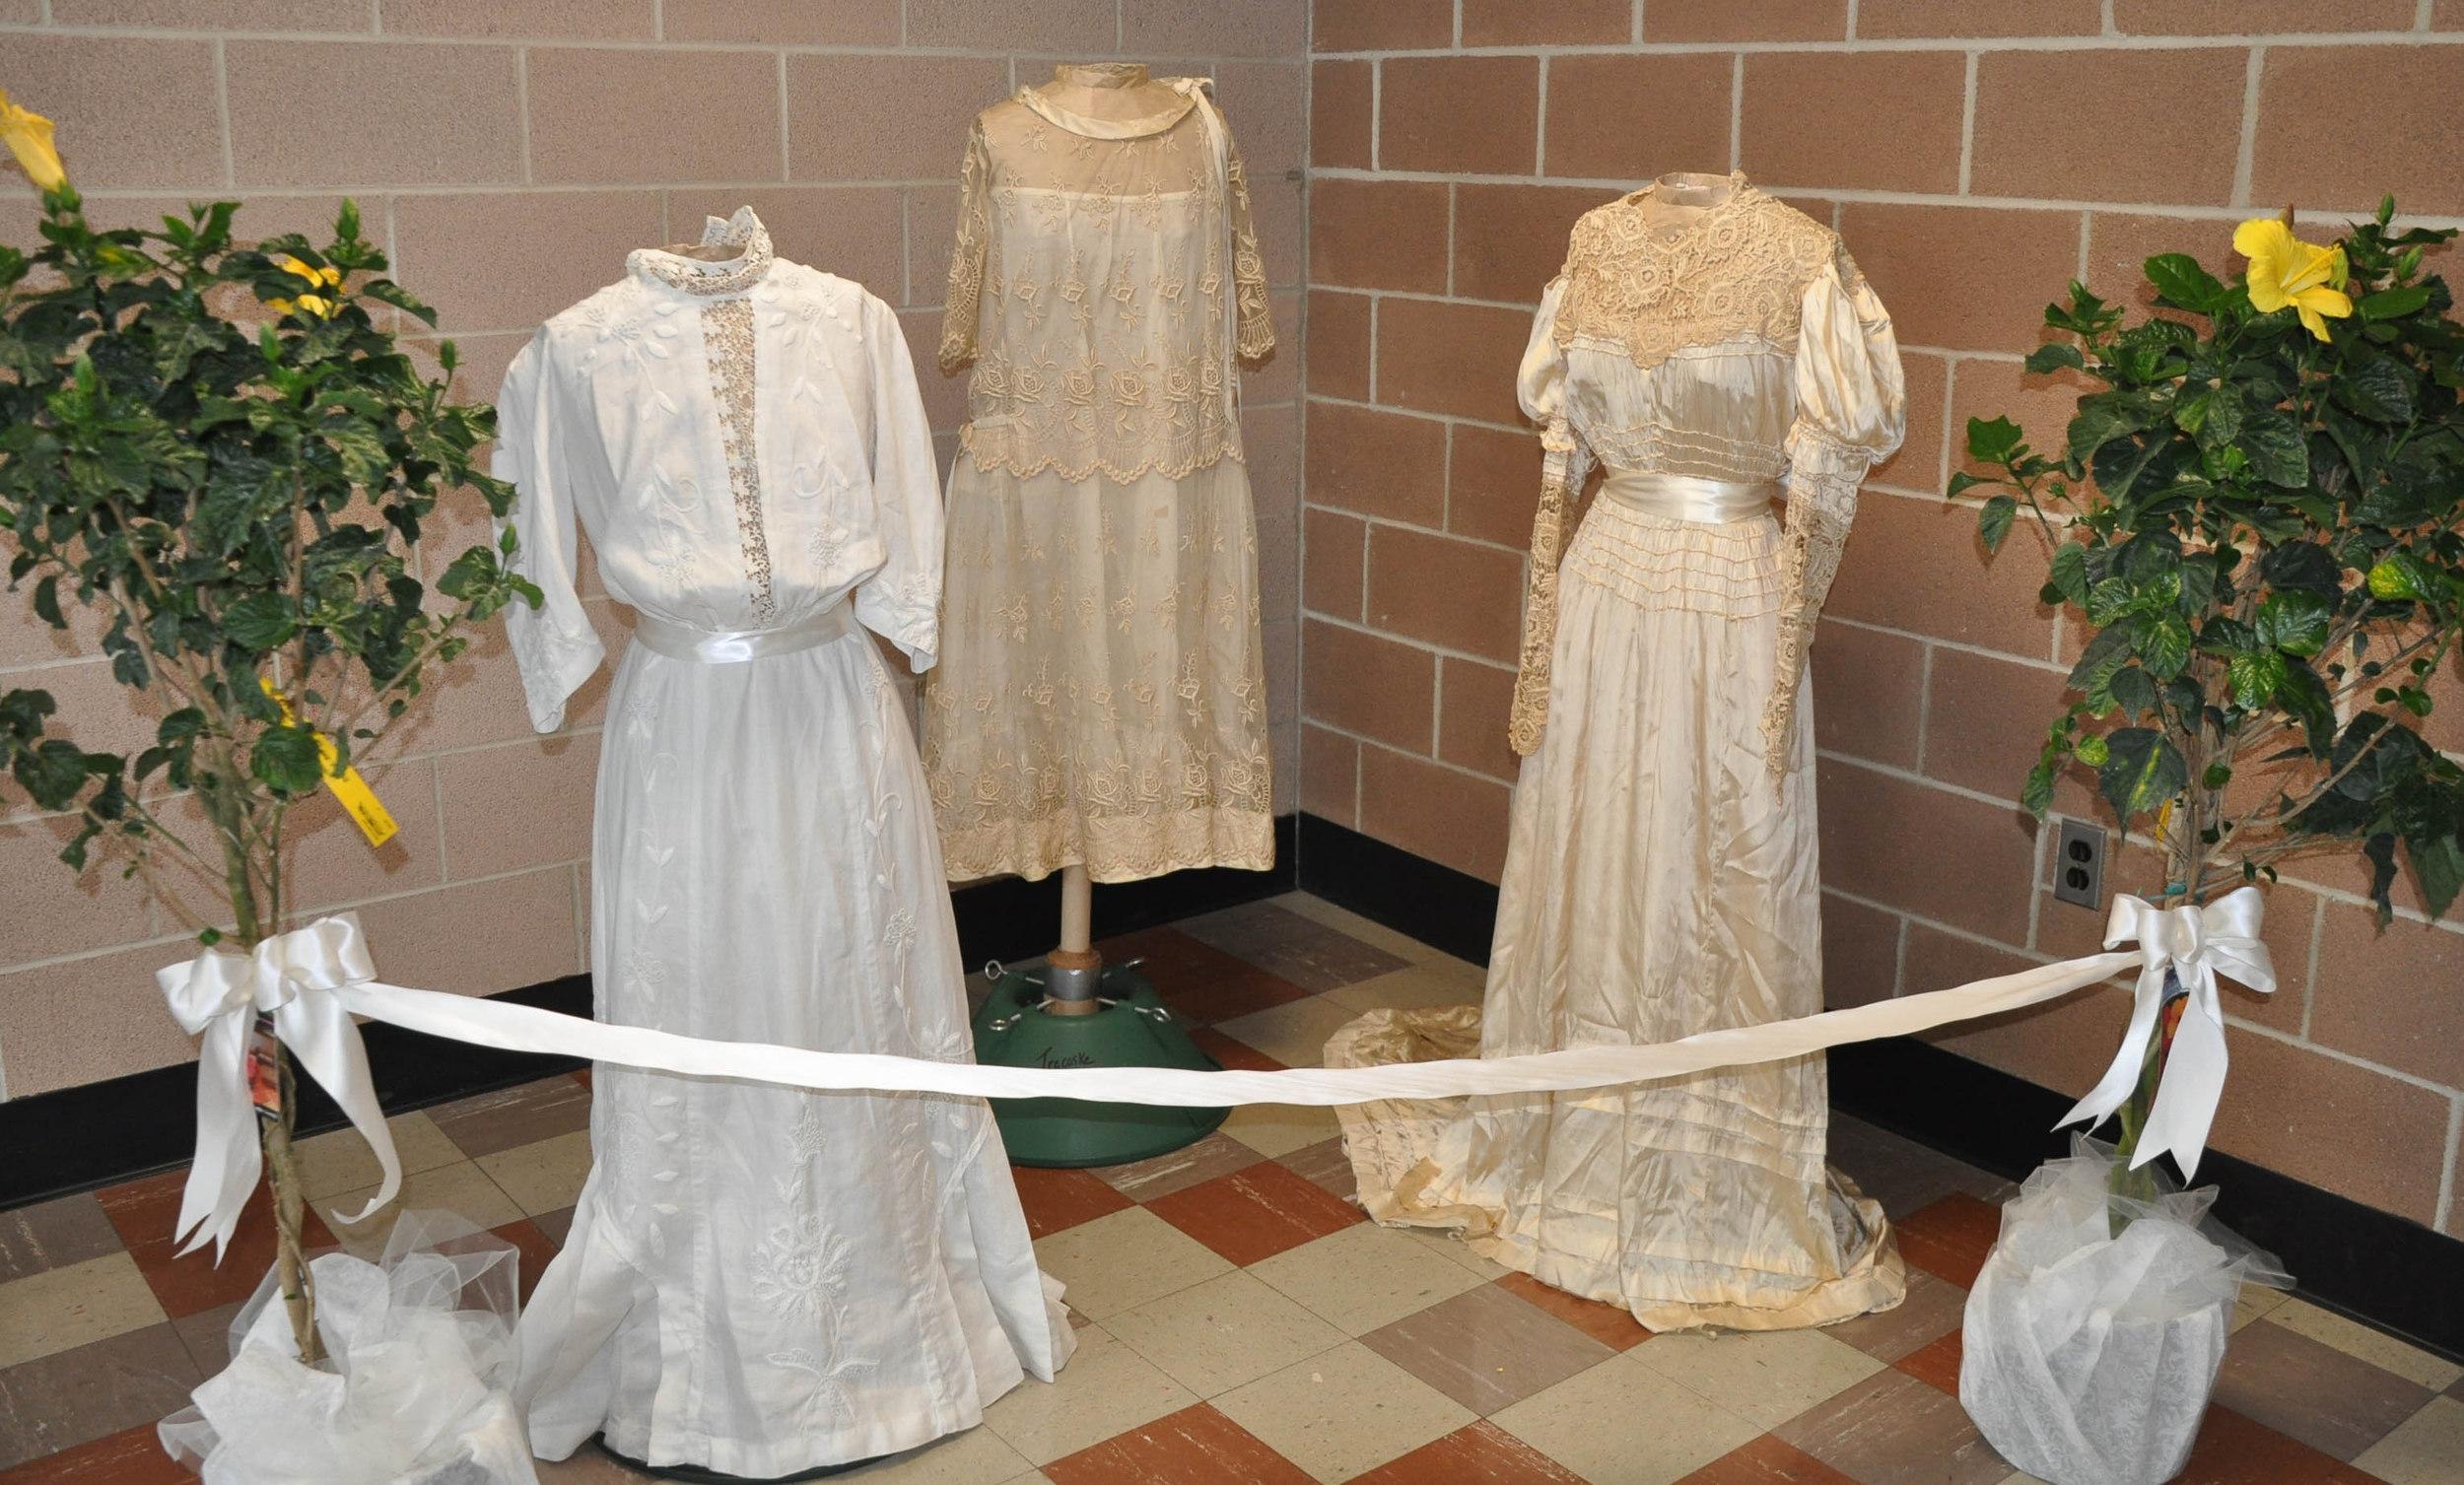 10arrangements and wedding gown6 cr.jpg